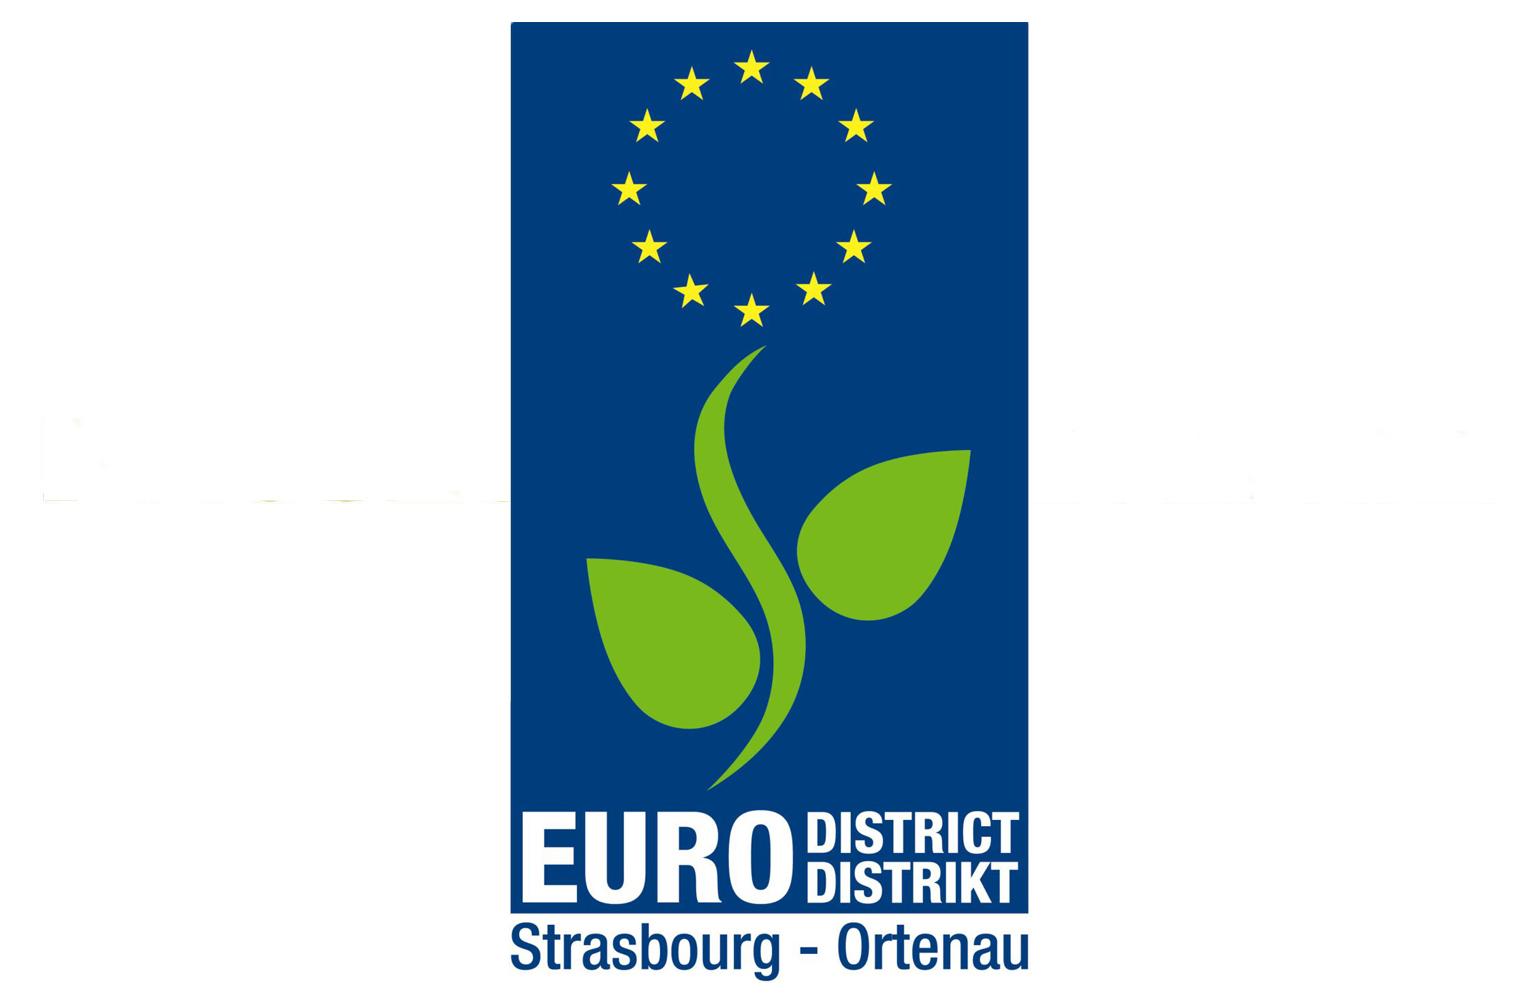 Eurodistrict Ortenau logo